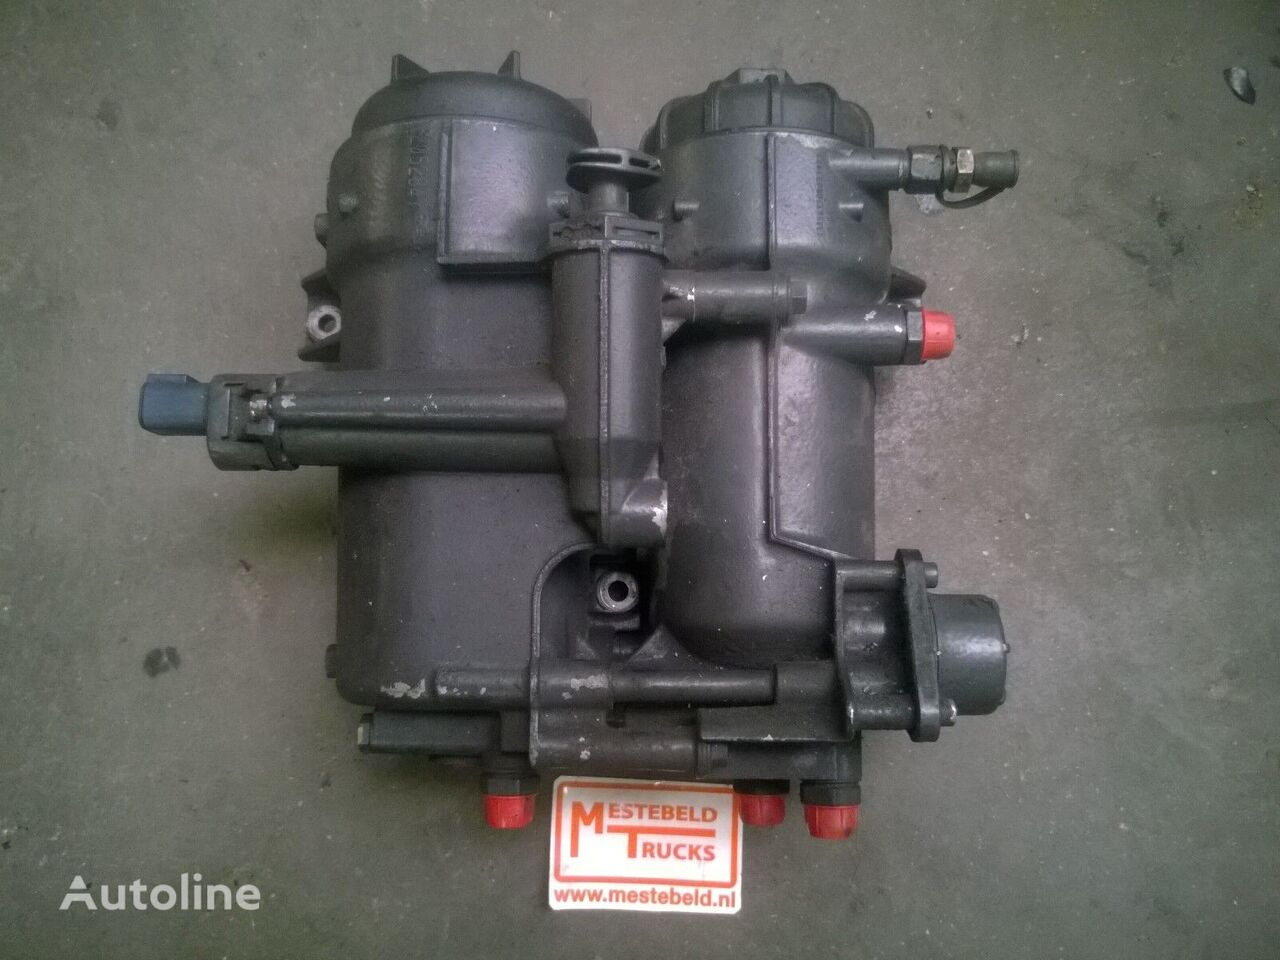 SCANIA Brandstoffilterhuis dubbel fuel filter for SCANIA truck